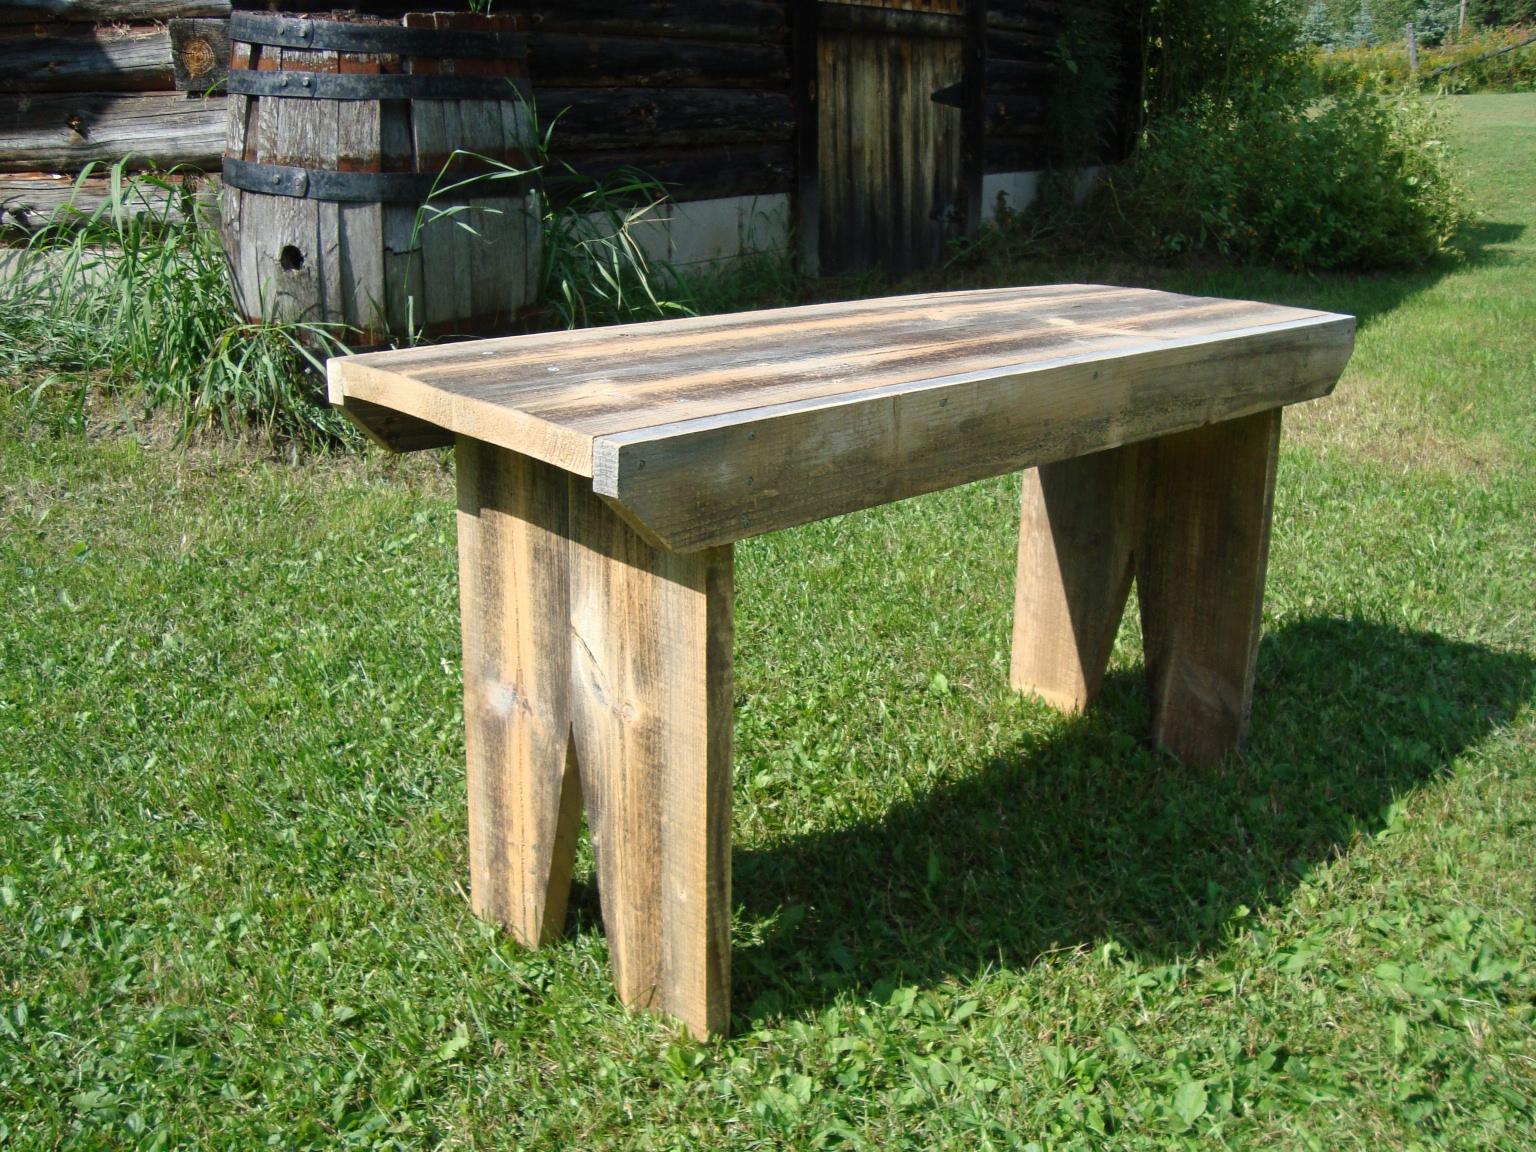 Follow Your Heart Woodworking Barn Board Bench